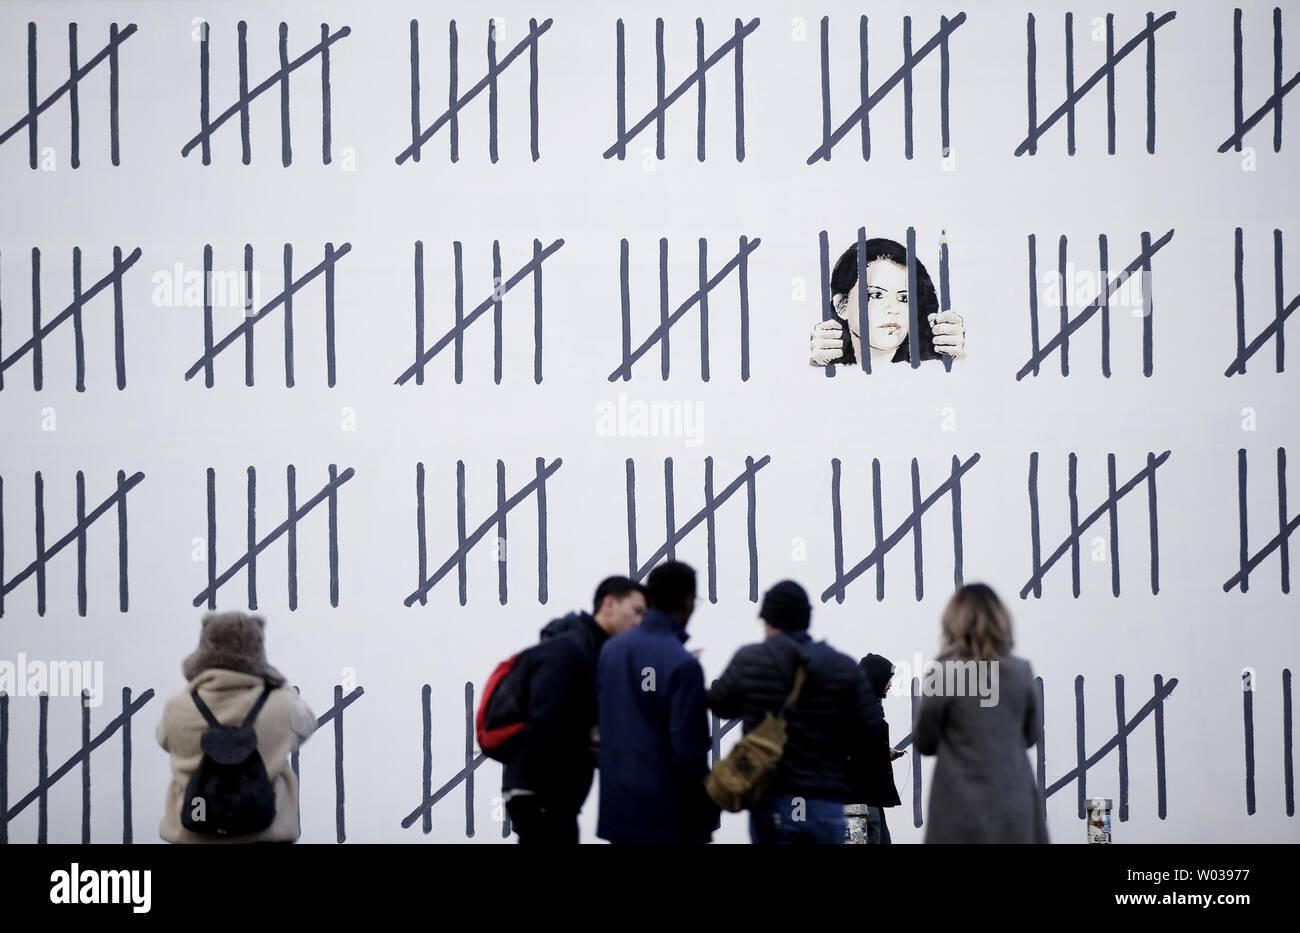 A mural on Houston Street in Manhattan highlighting the case